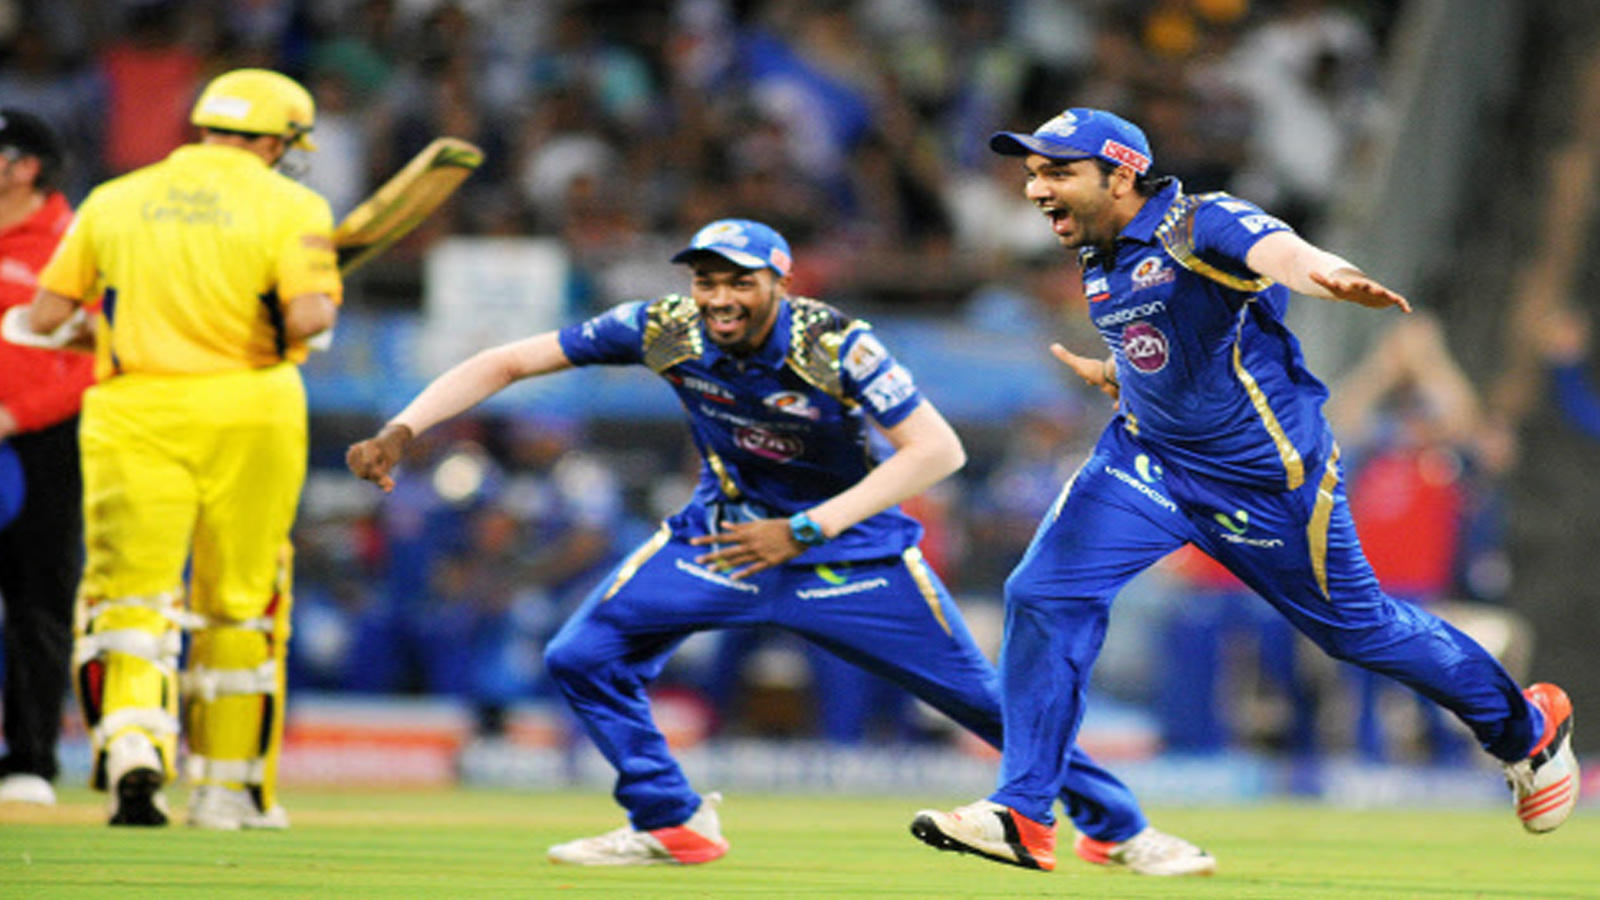 ipl-13-mumbai-indians-vs-csk-in-opening-clash